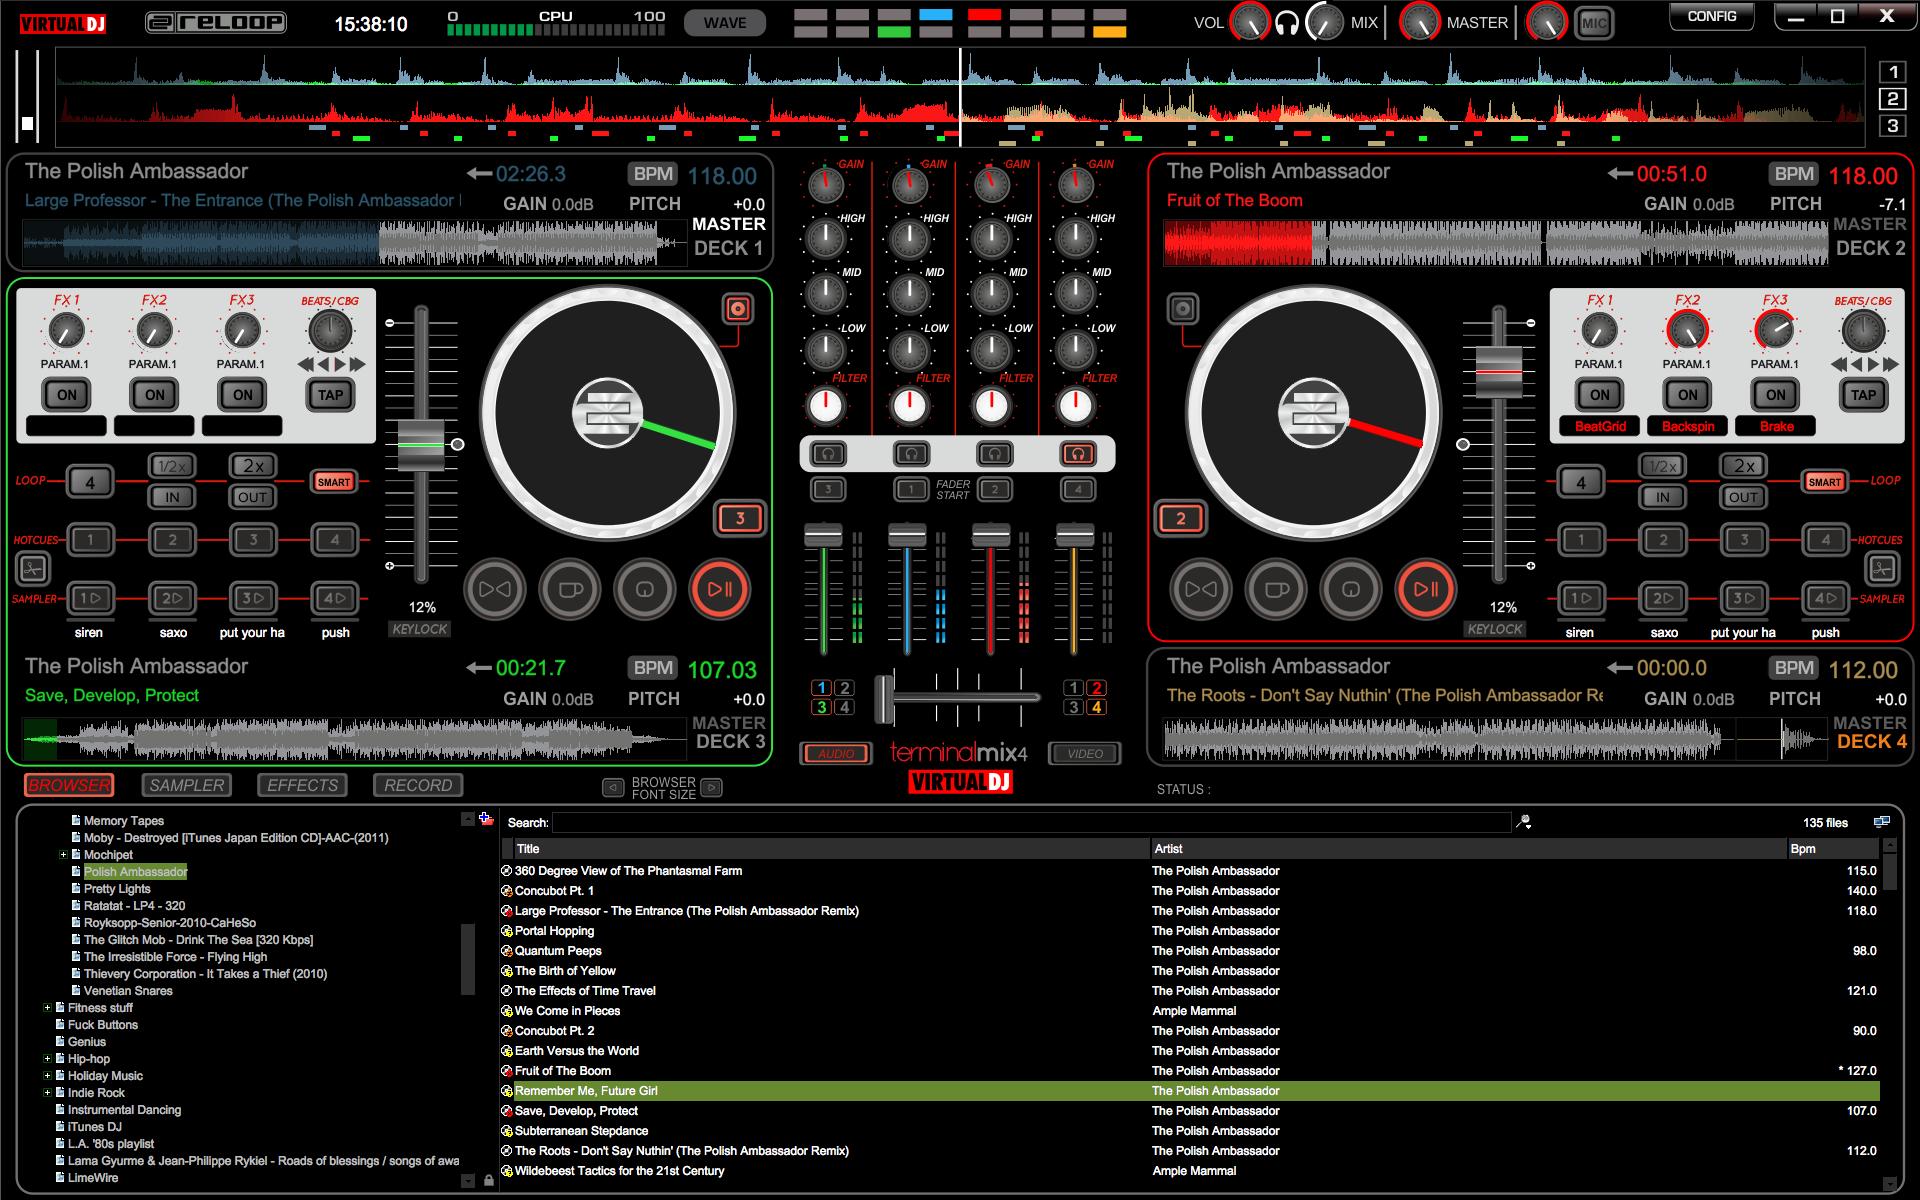 Virtual DJ Wallpaper